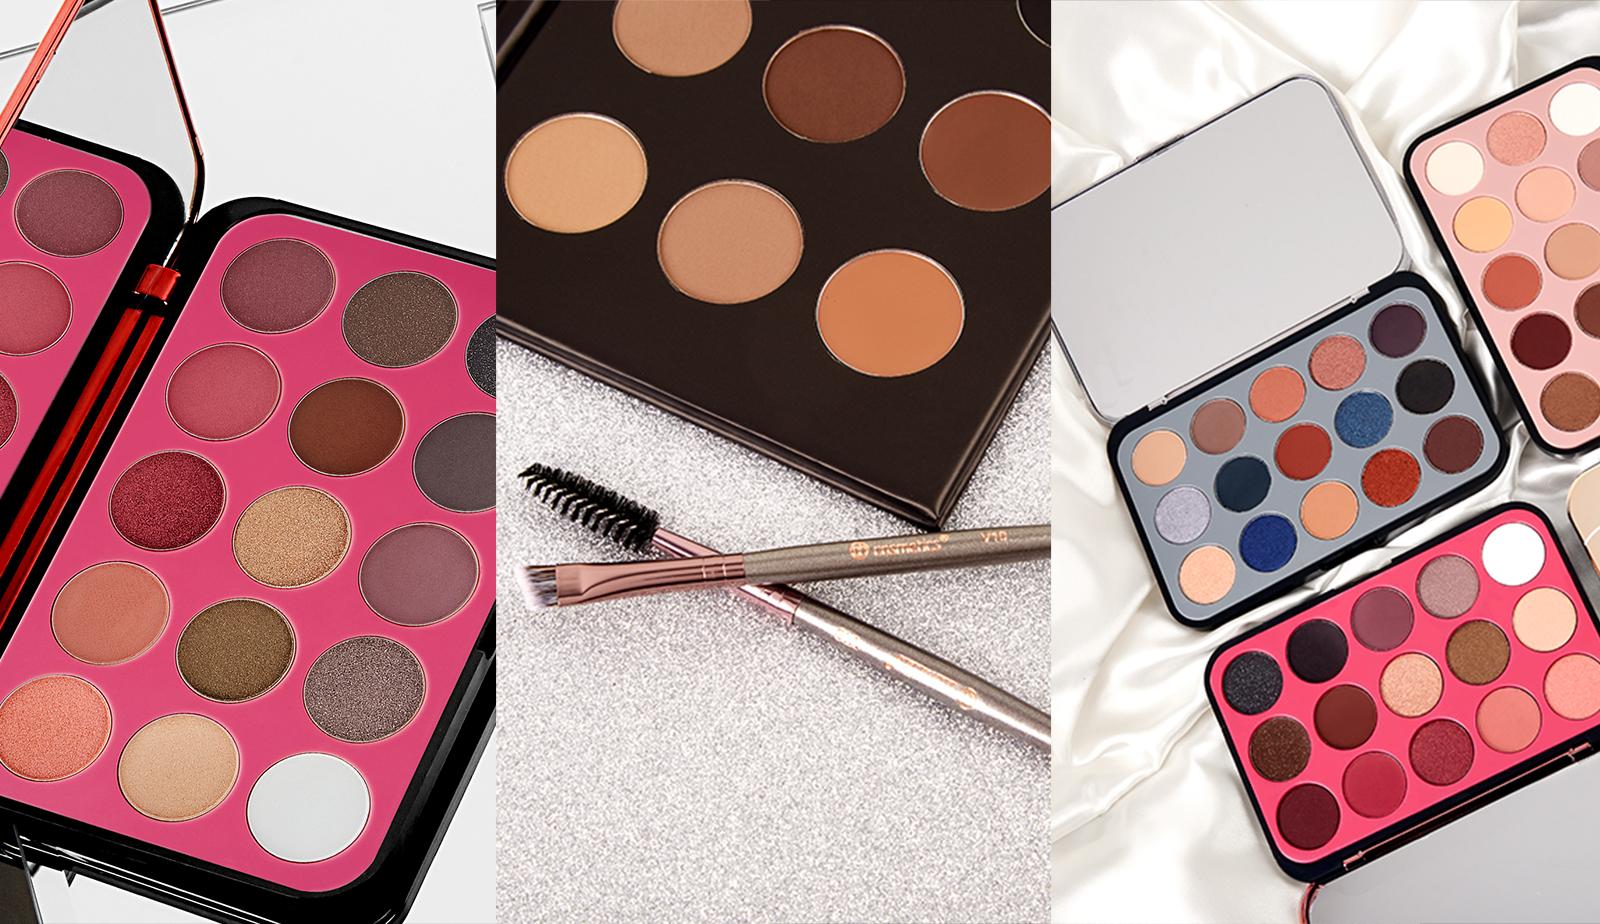 BH_Cosmetics_VIVA_GLAM_Magazine_Our_Favorite_BH_Cosmetics_Main_Image